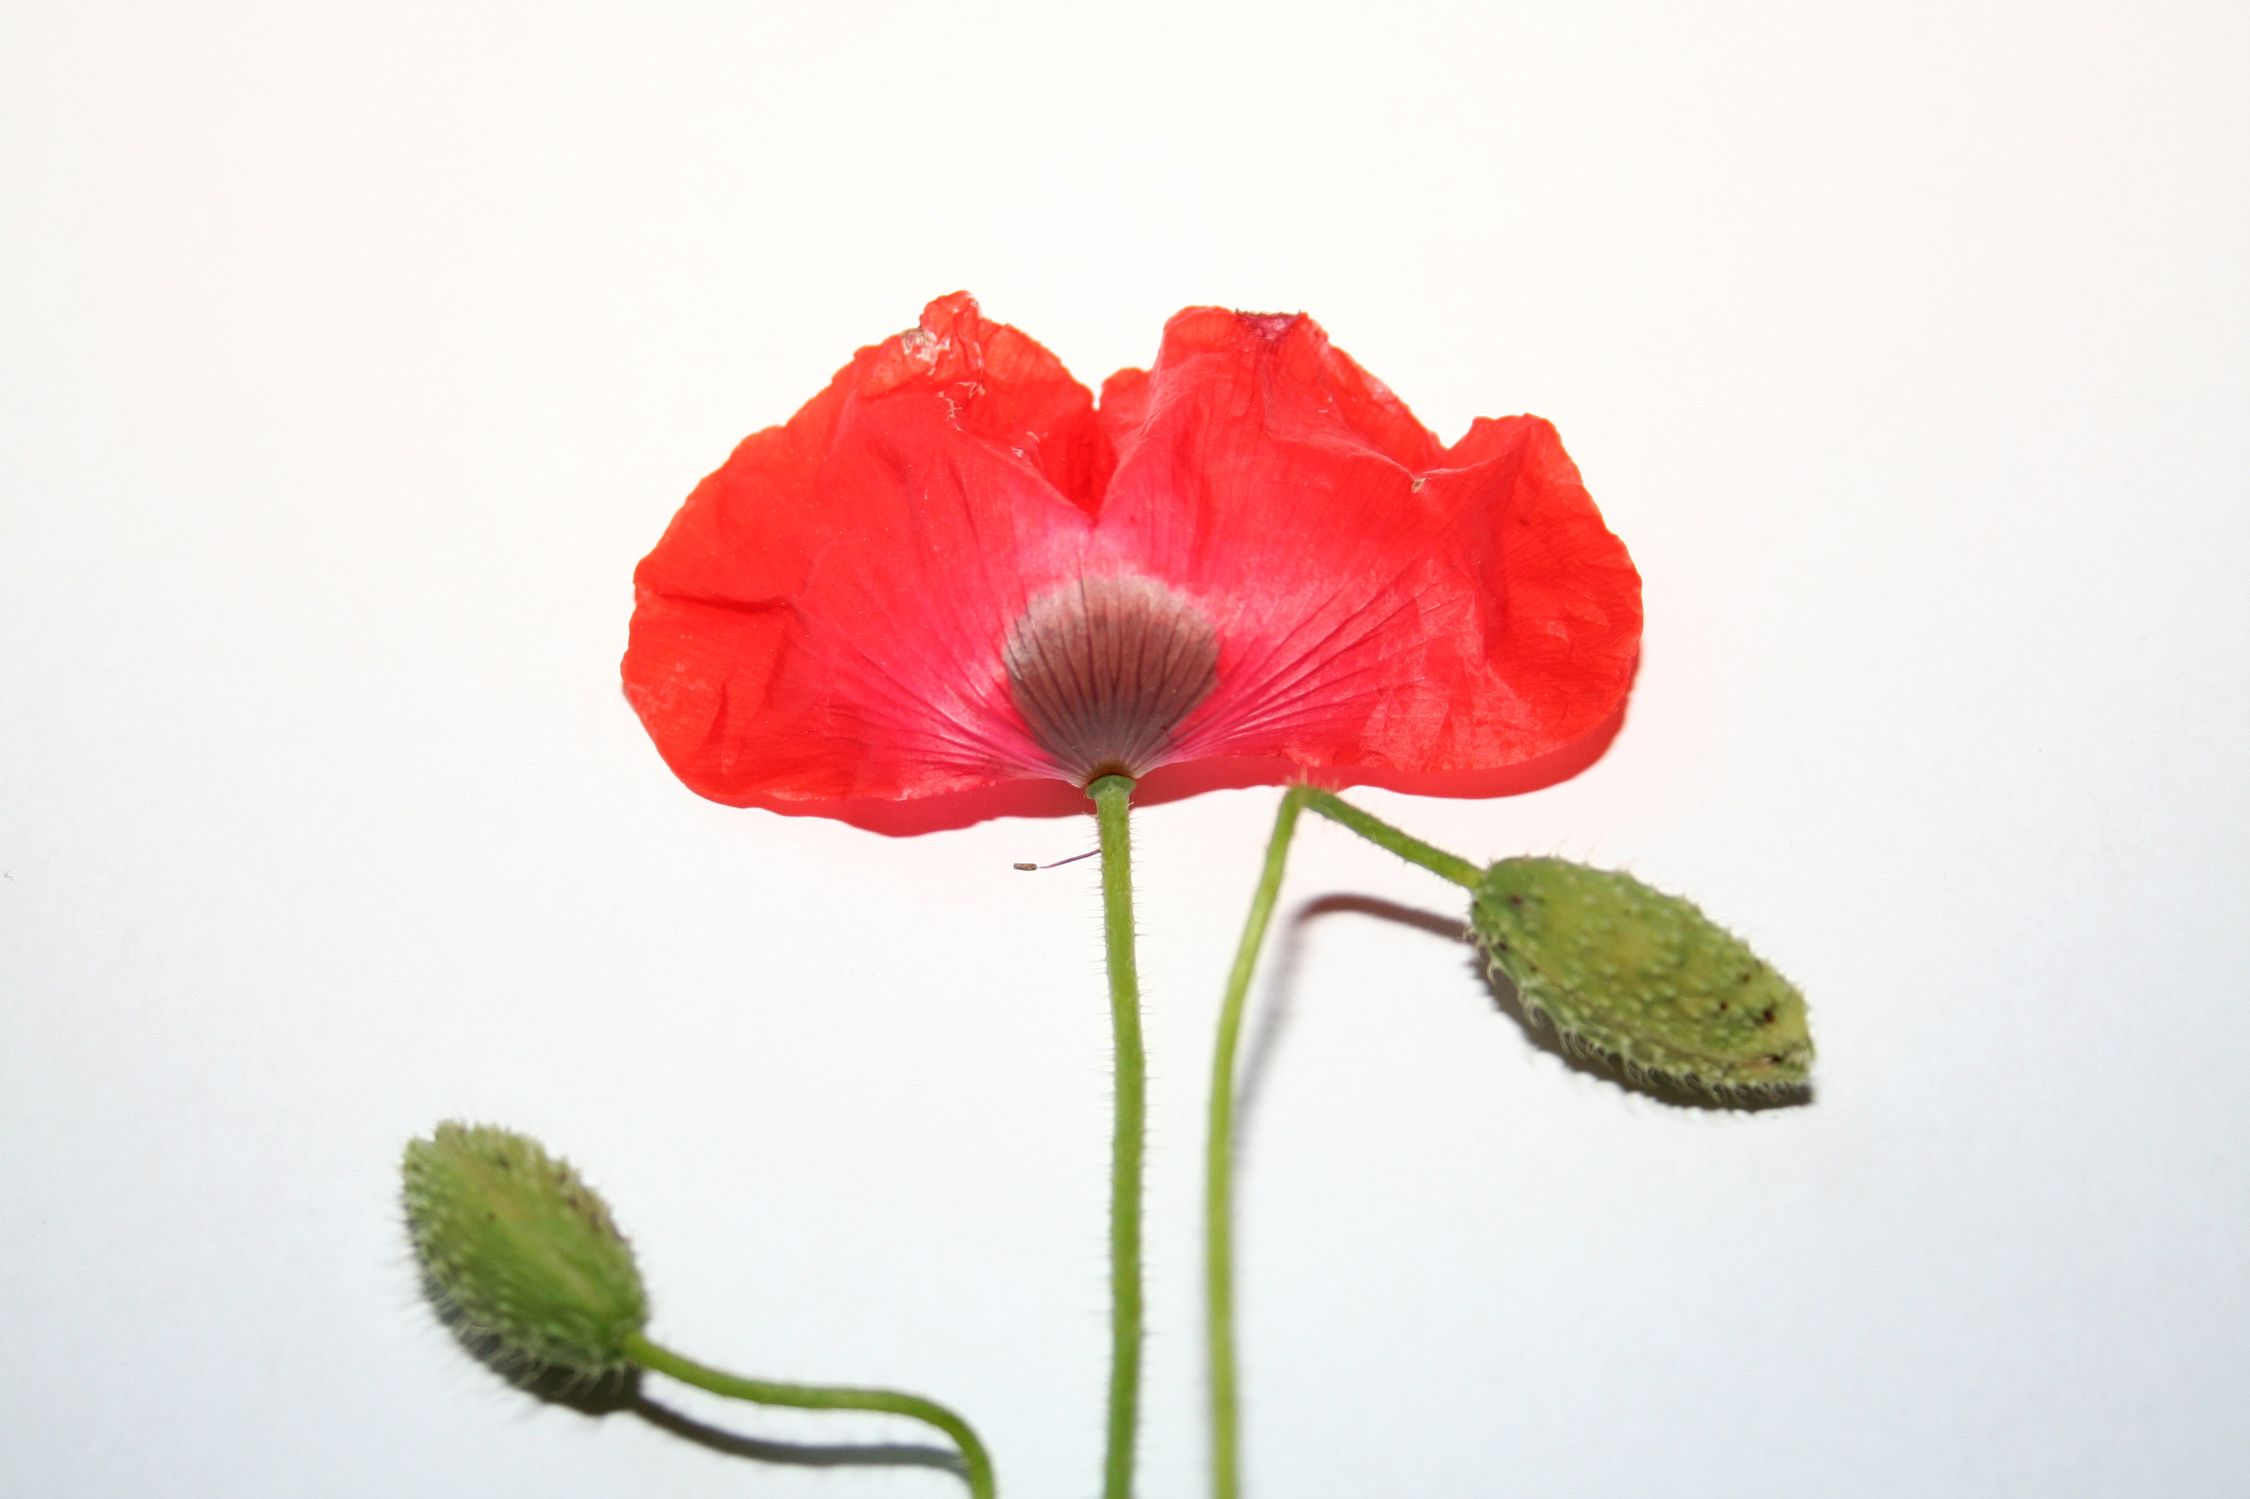 Bild mit Farben, Natur, Pflanzen, Blumen, Mohn, Pflanze, Mohnblume, Mohneblumen, Poppy, Poppies, Mohnpflanze, Klatschmohn, Klatschrose, Papaver, Mohngewächse, Papaveraceae